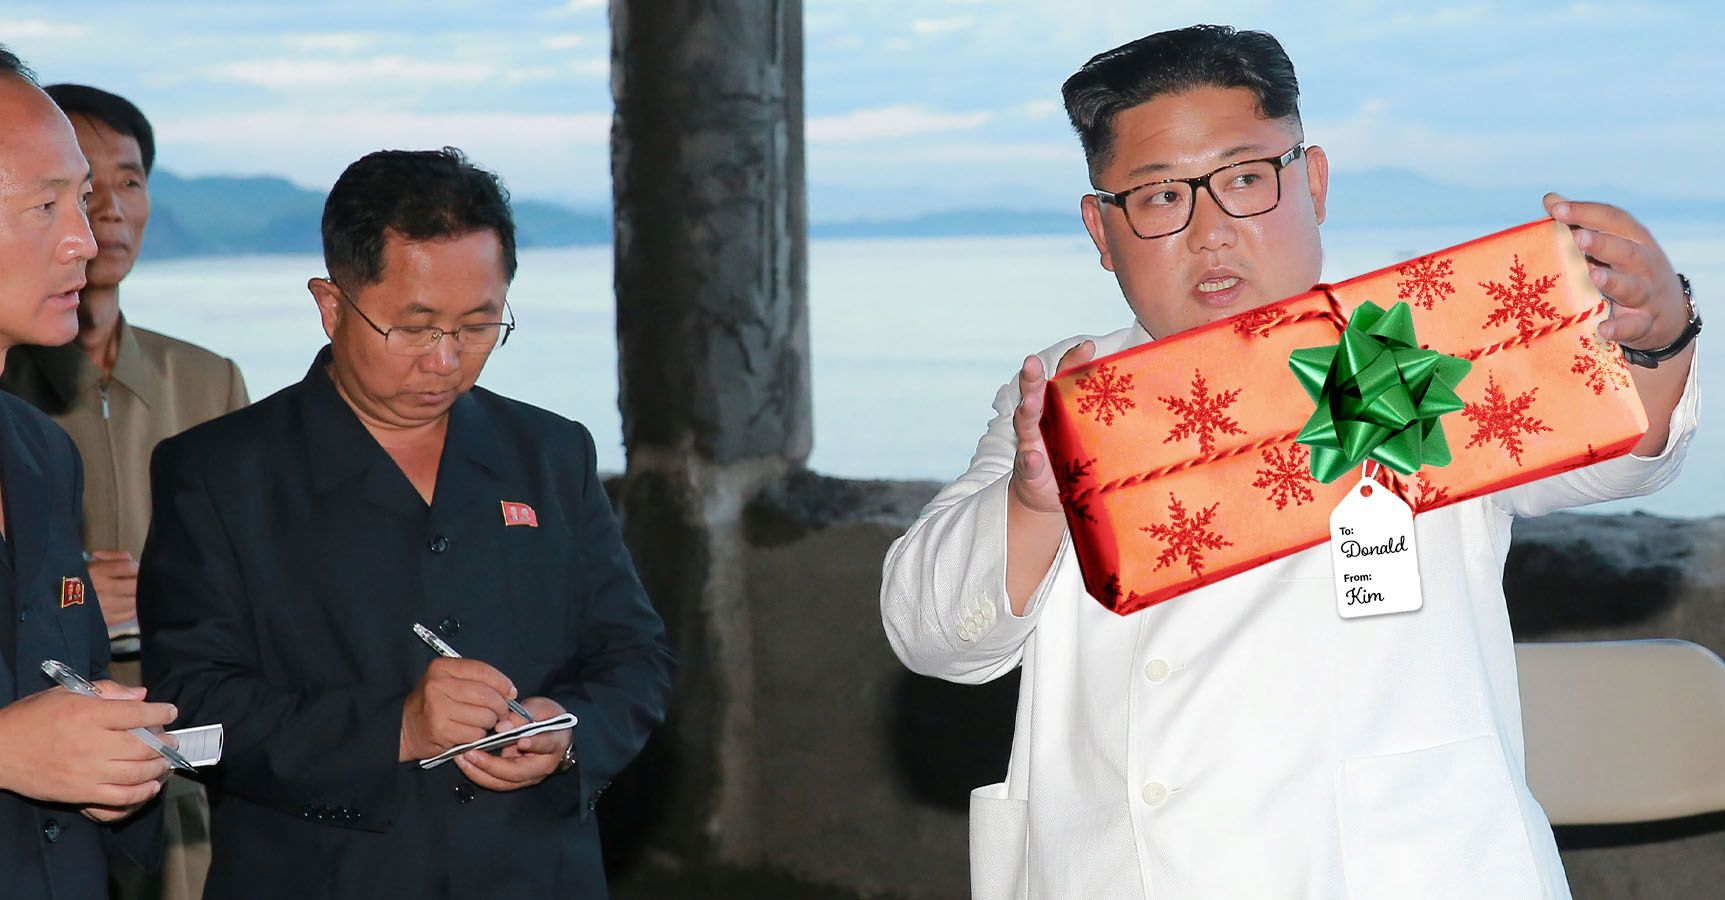 What We're Watching: It's a Kim Jong-un Christmas!